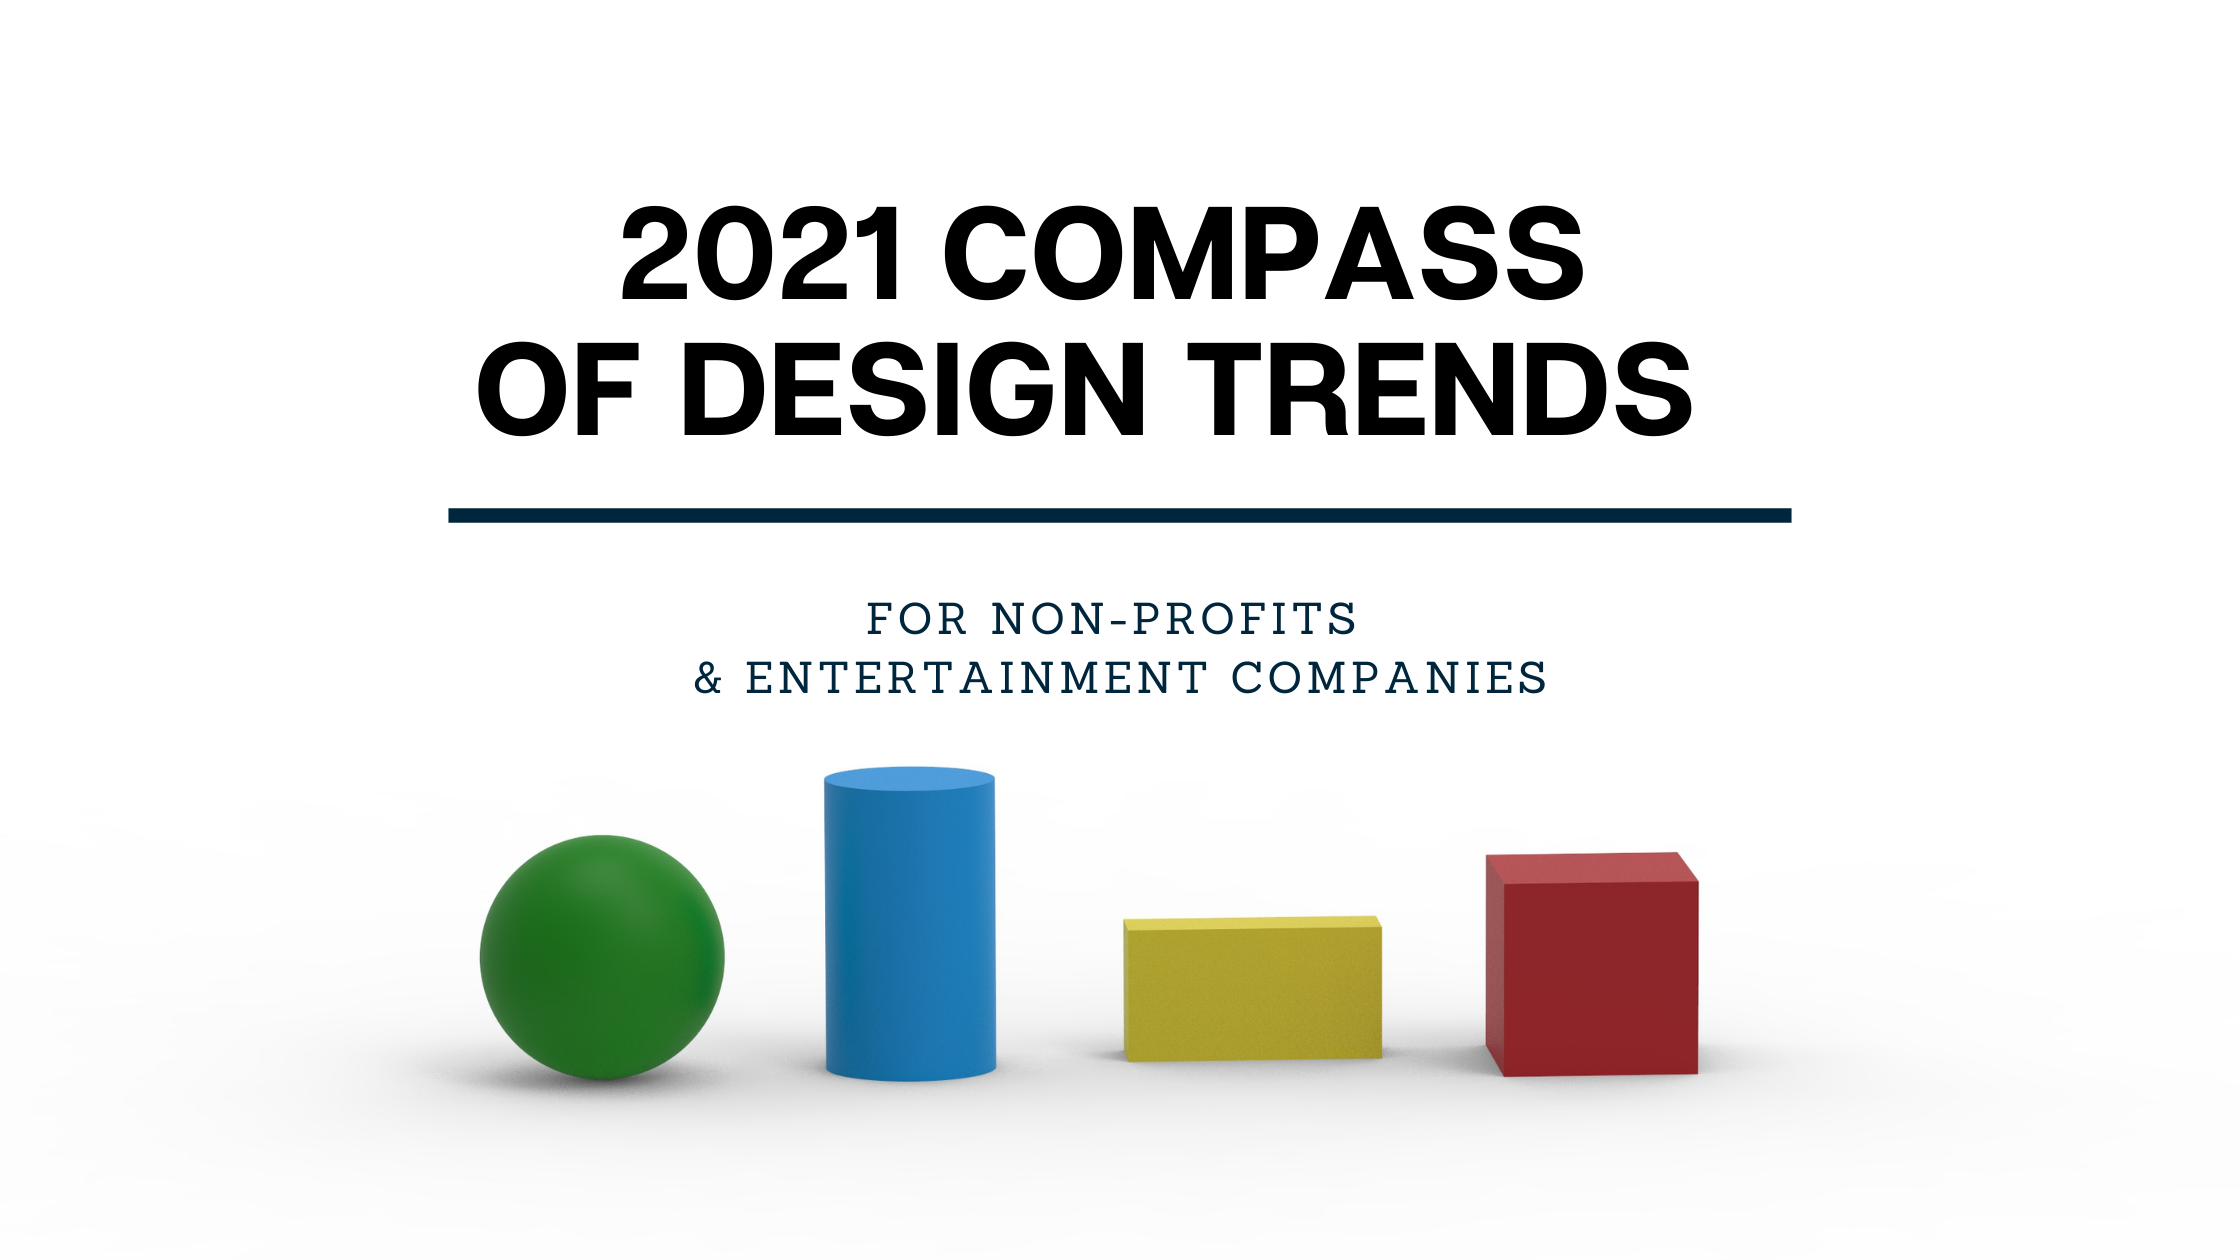 2021 Compass of Design Trends for Non-Profits & Entertainment Companies